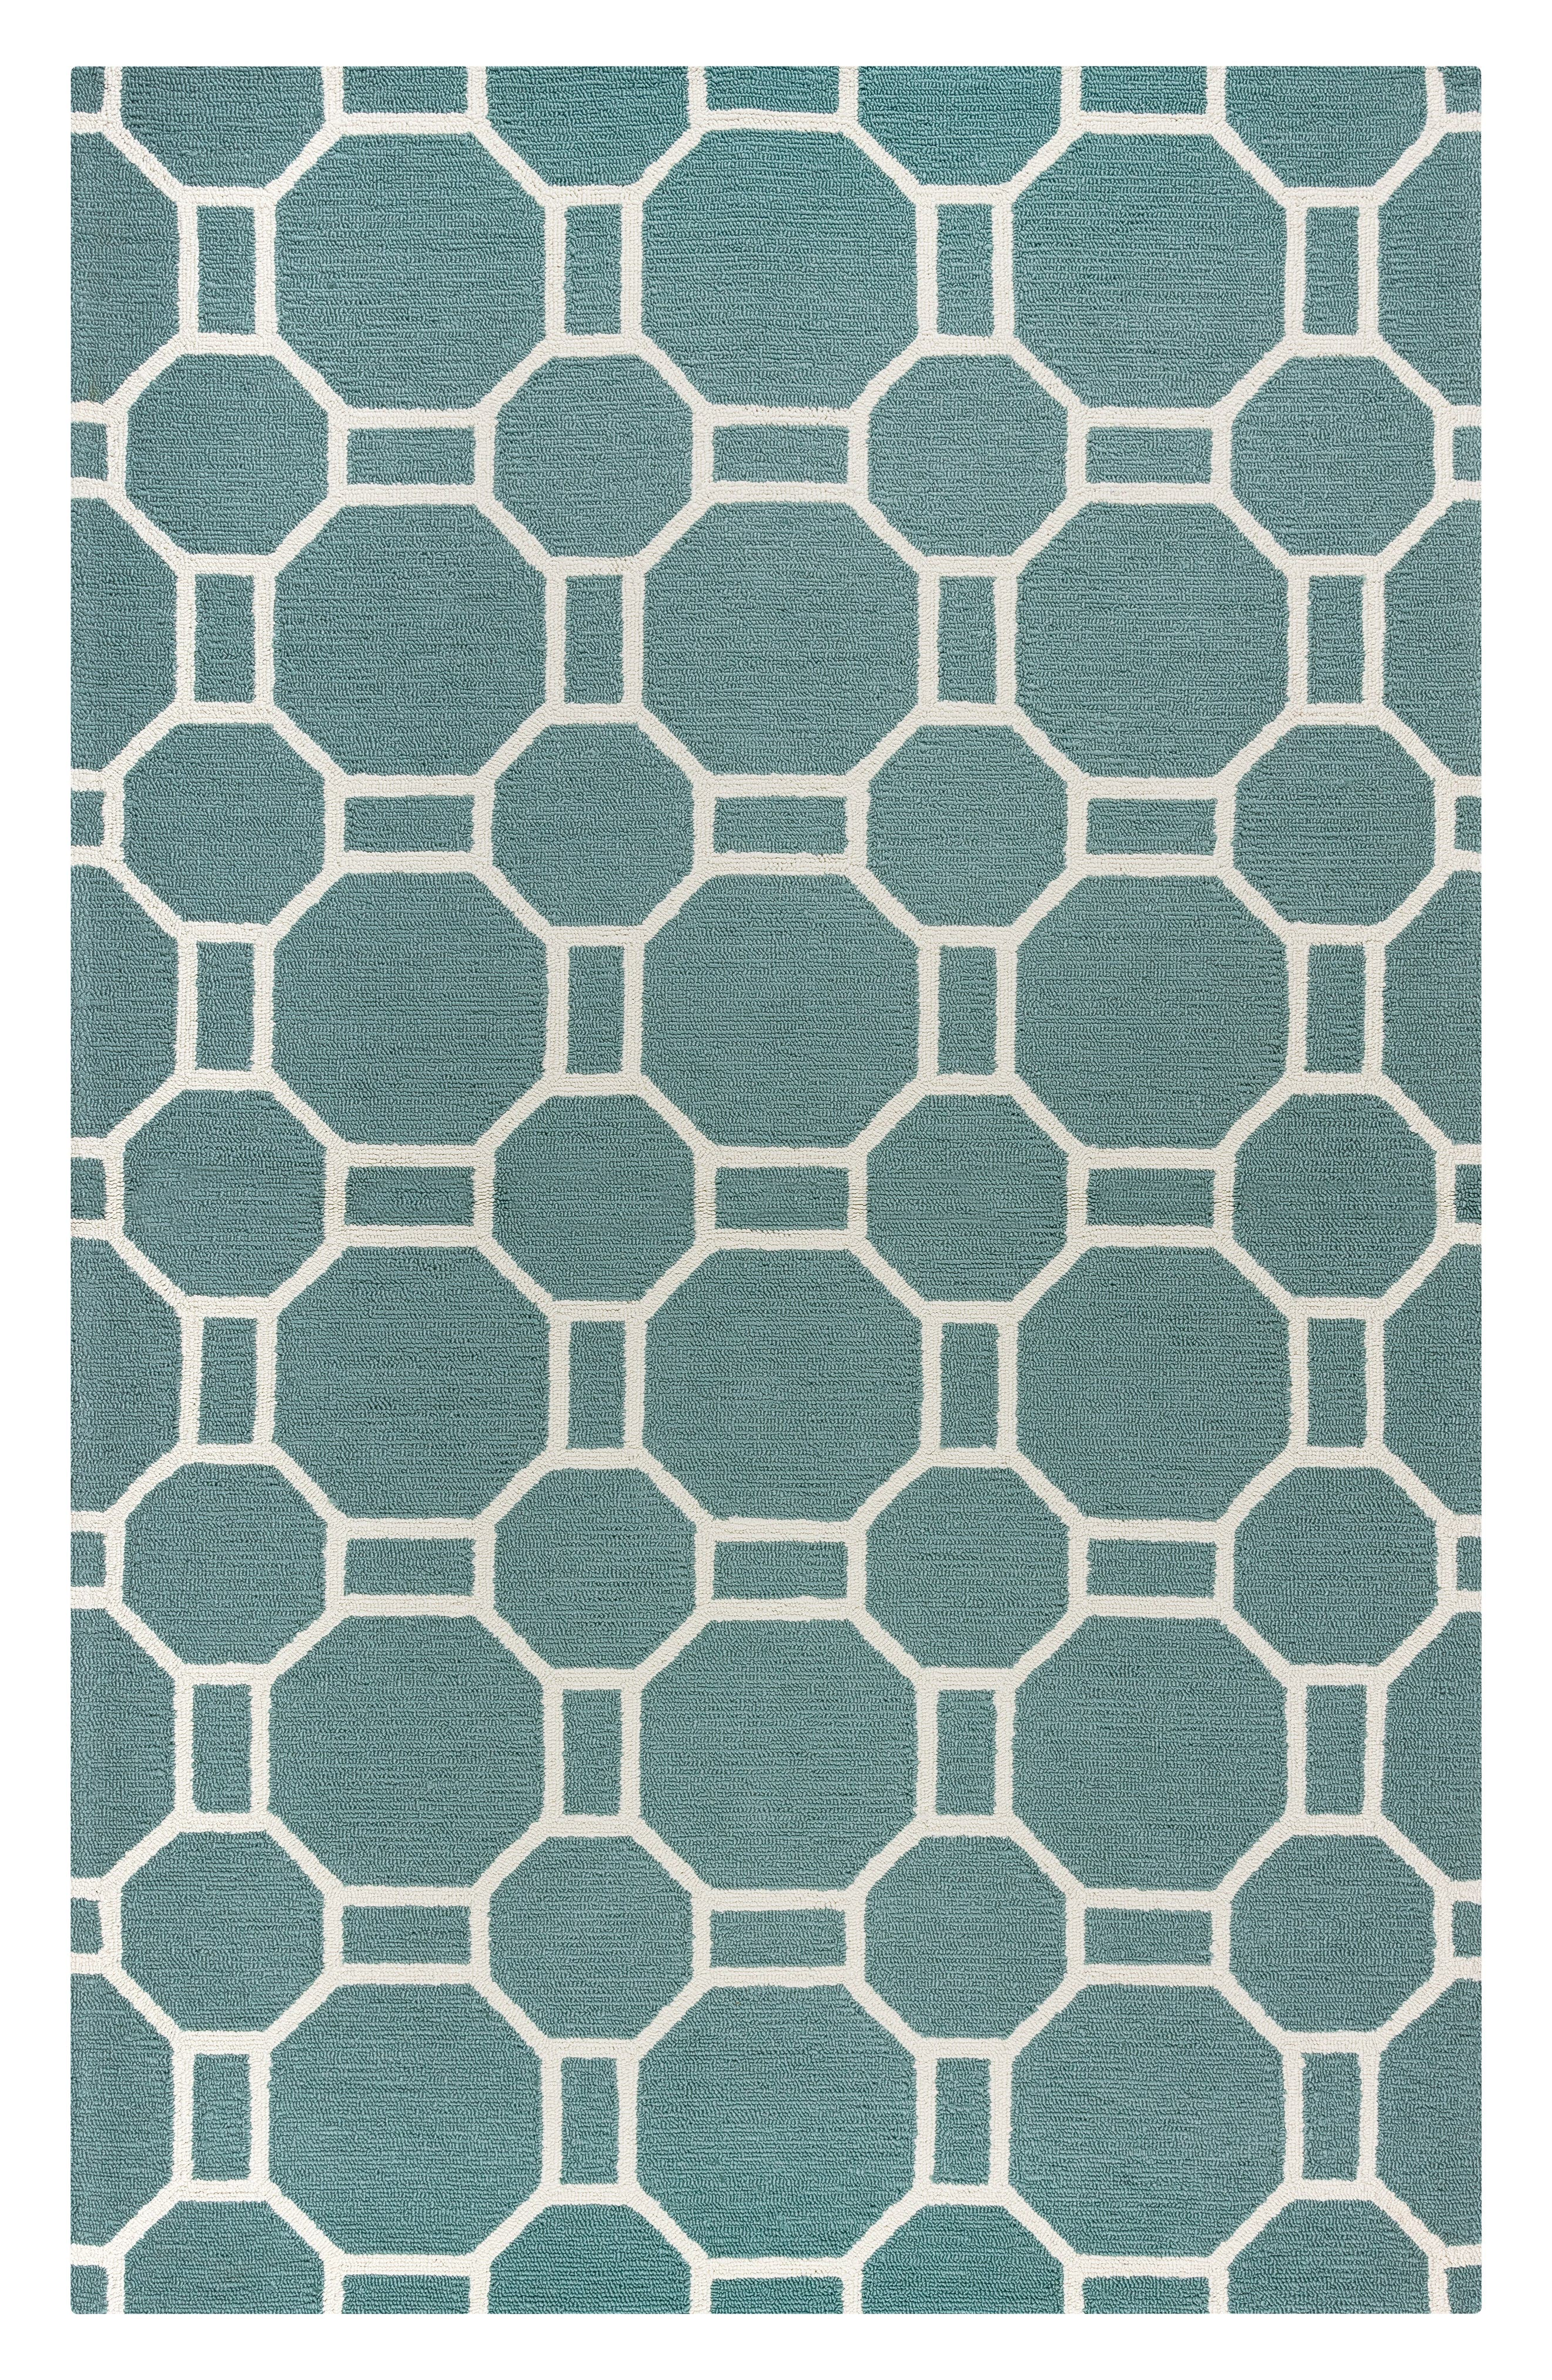 Azzura Hill Suzy Rug,                             Main thumbnail 1, color,                             300